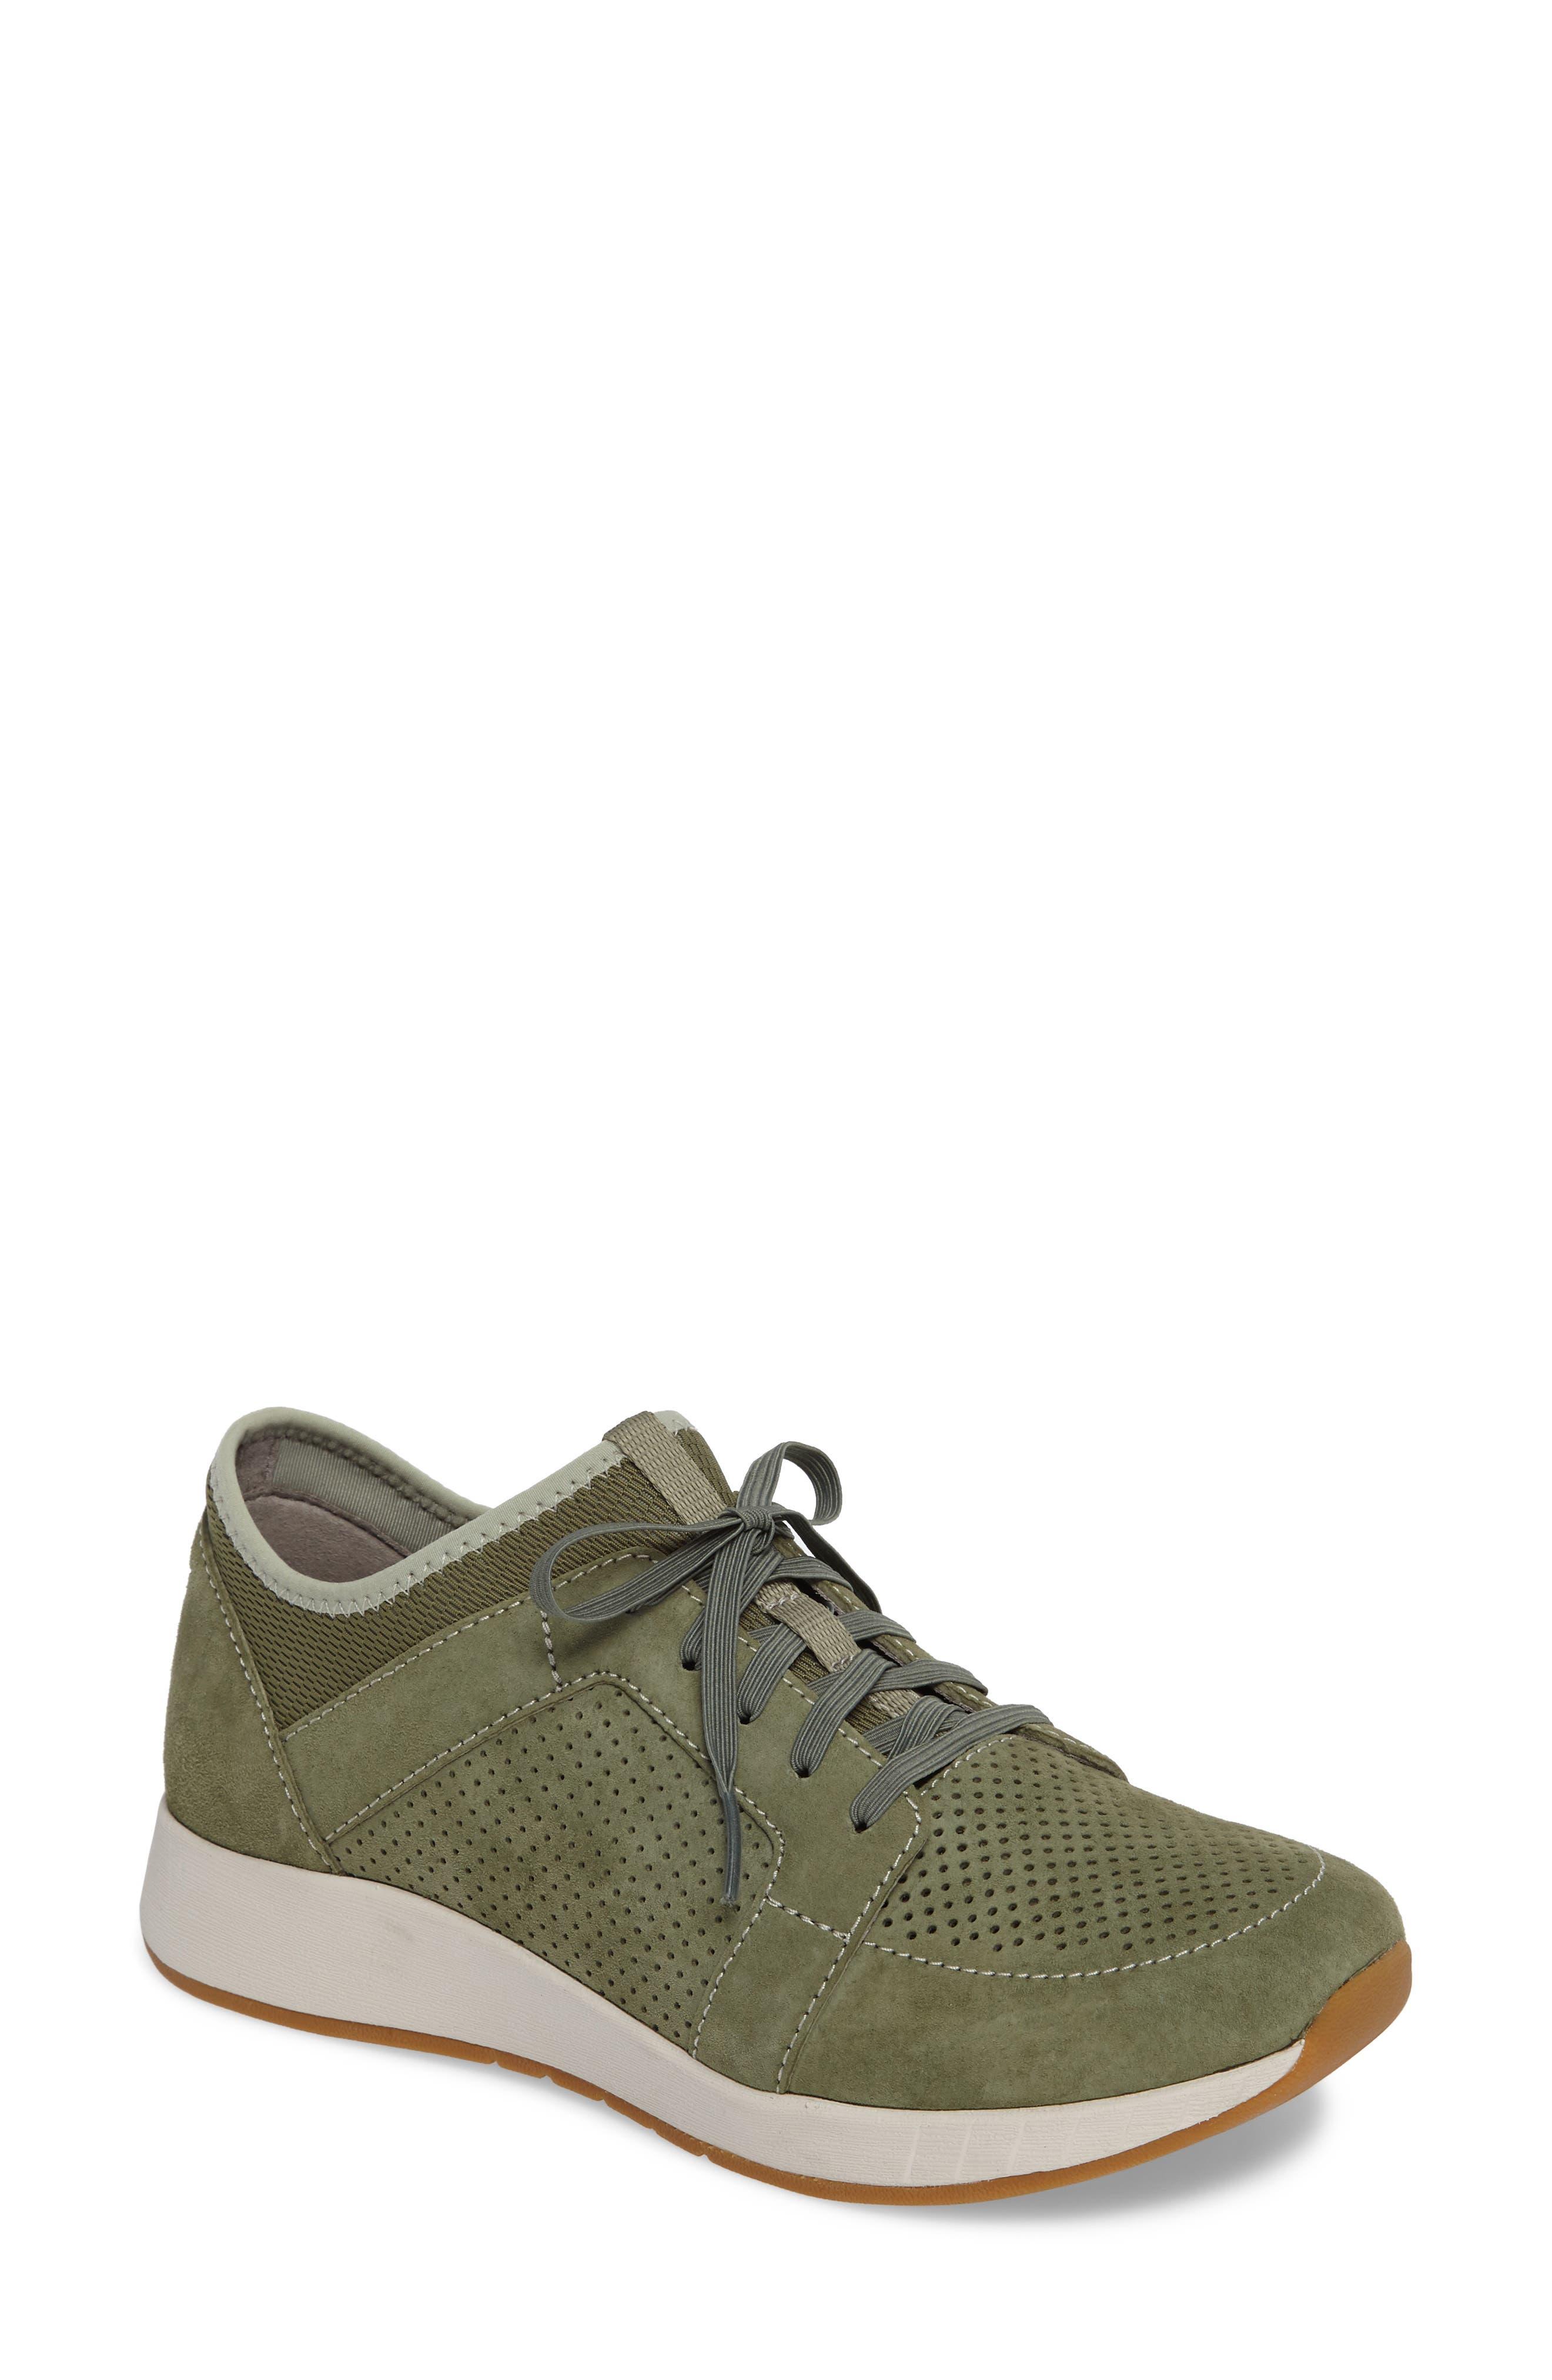 DANSKO Cozette Slip-On Sneaker